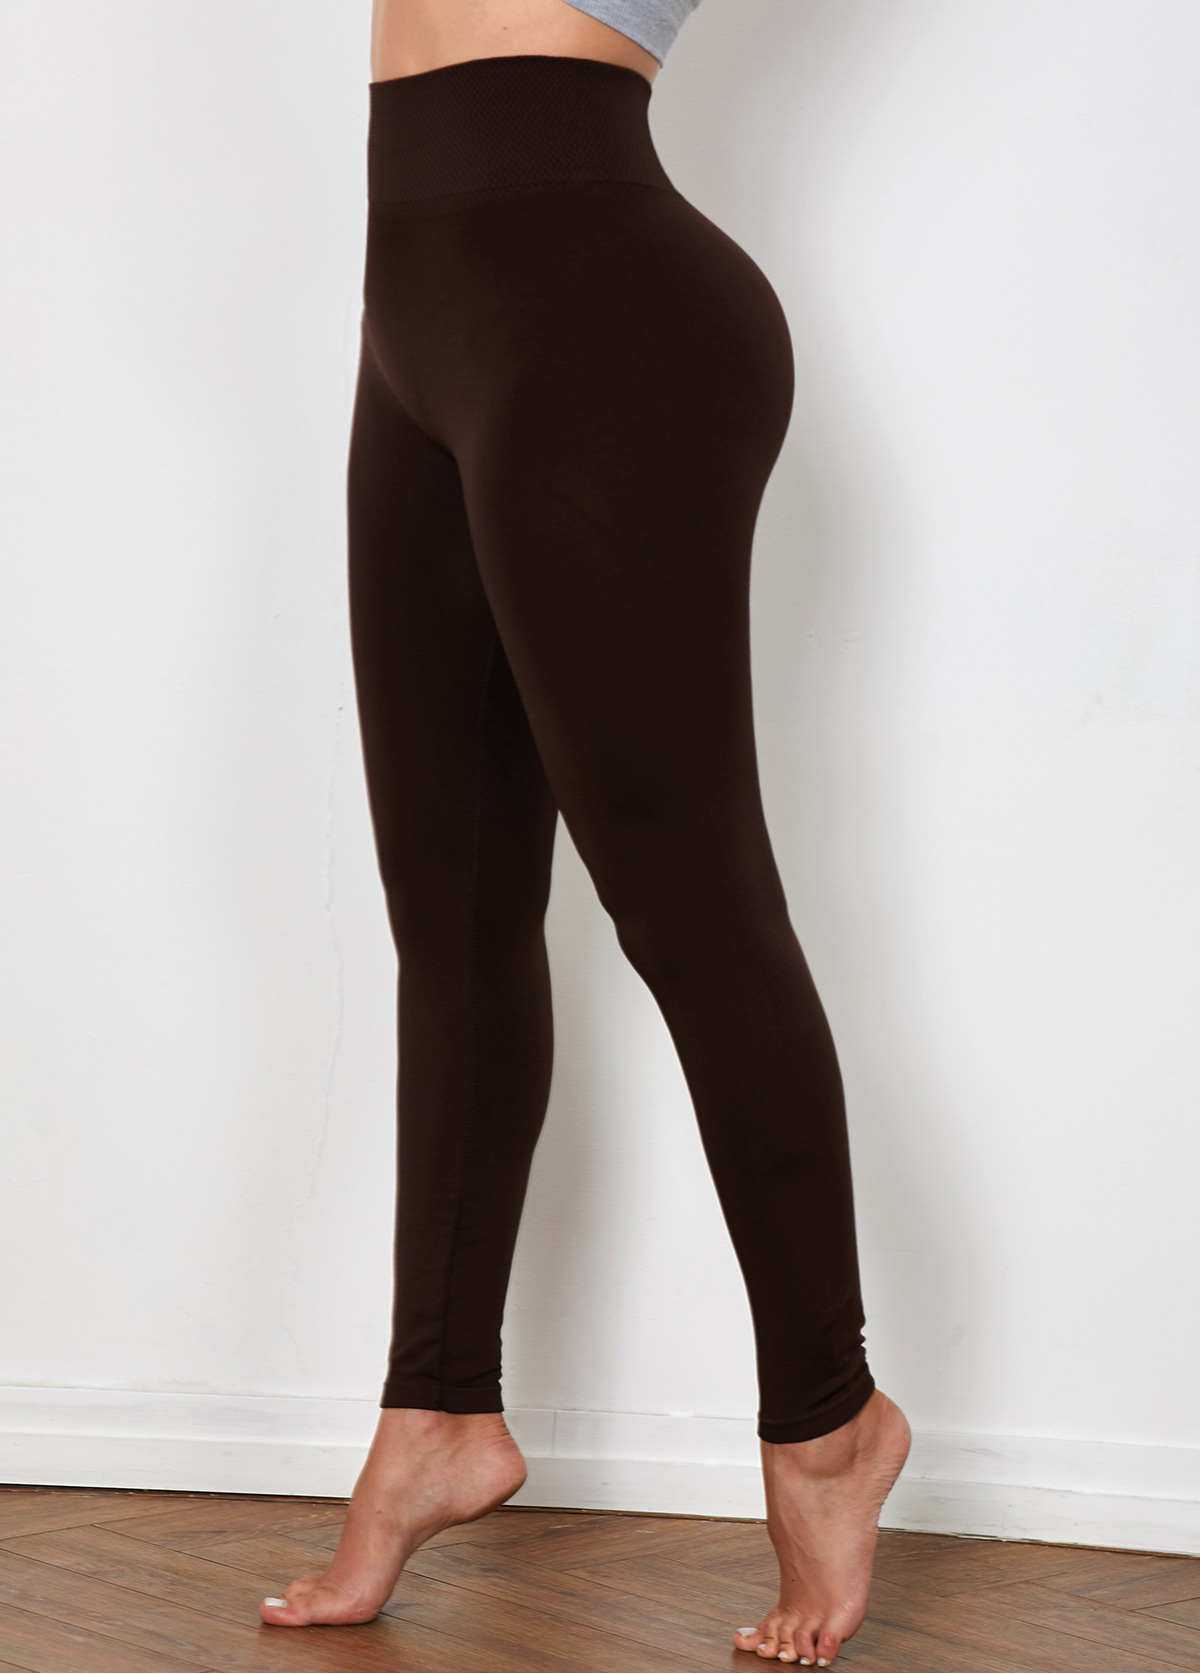 High Waist Brown Super Elastic Legging